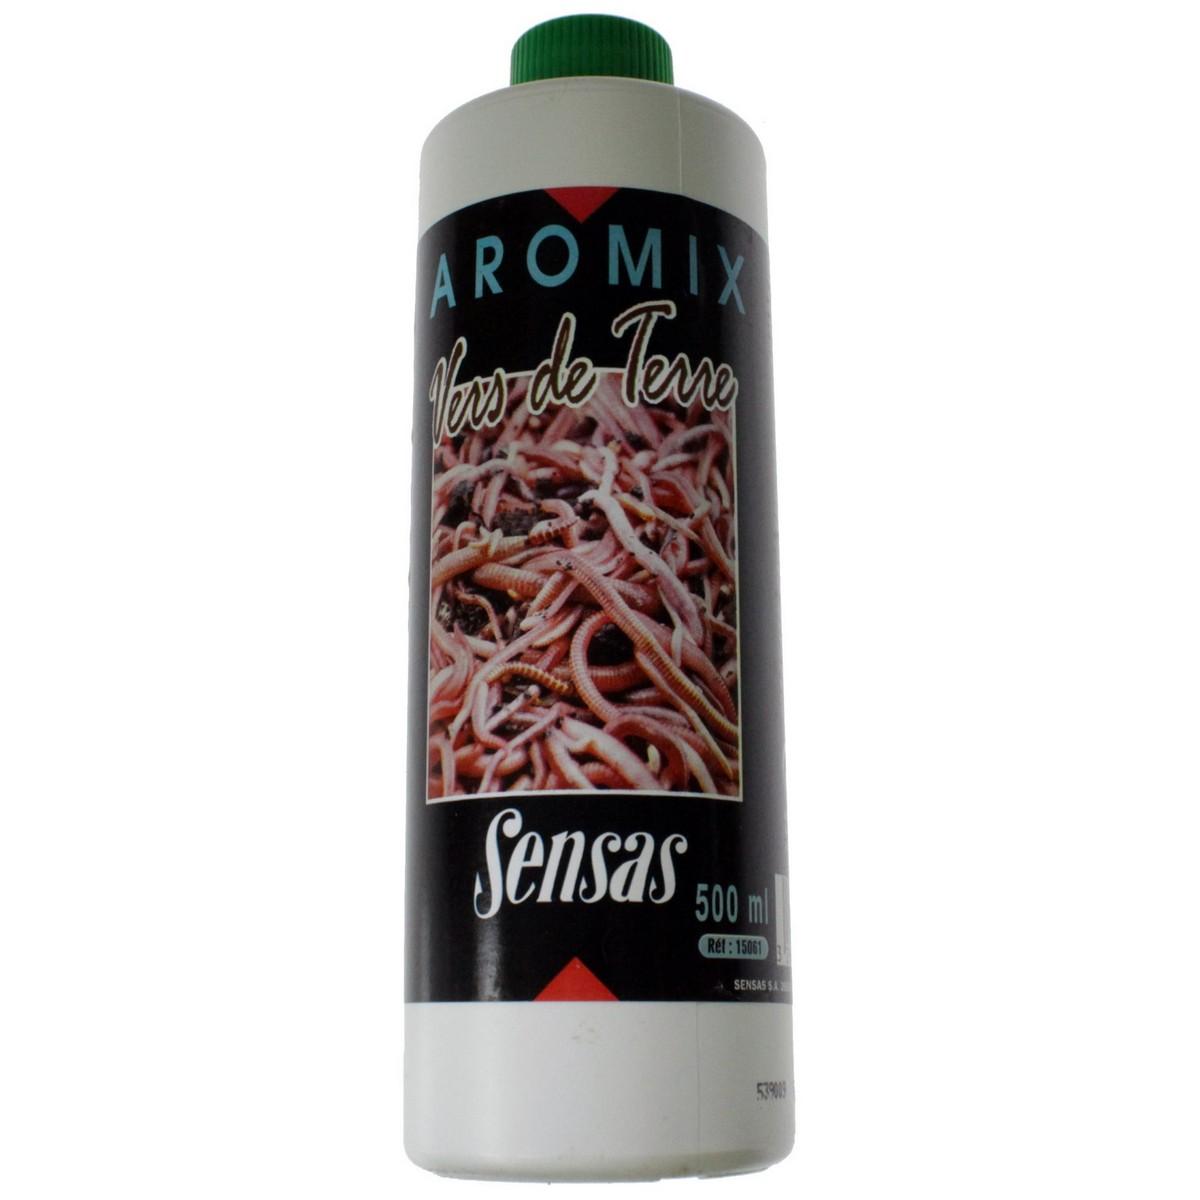 Течен ароматизатор Sensas Aromix Vers de Terre